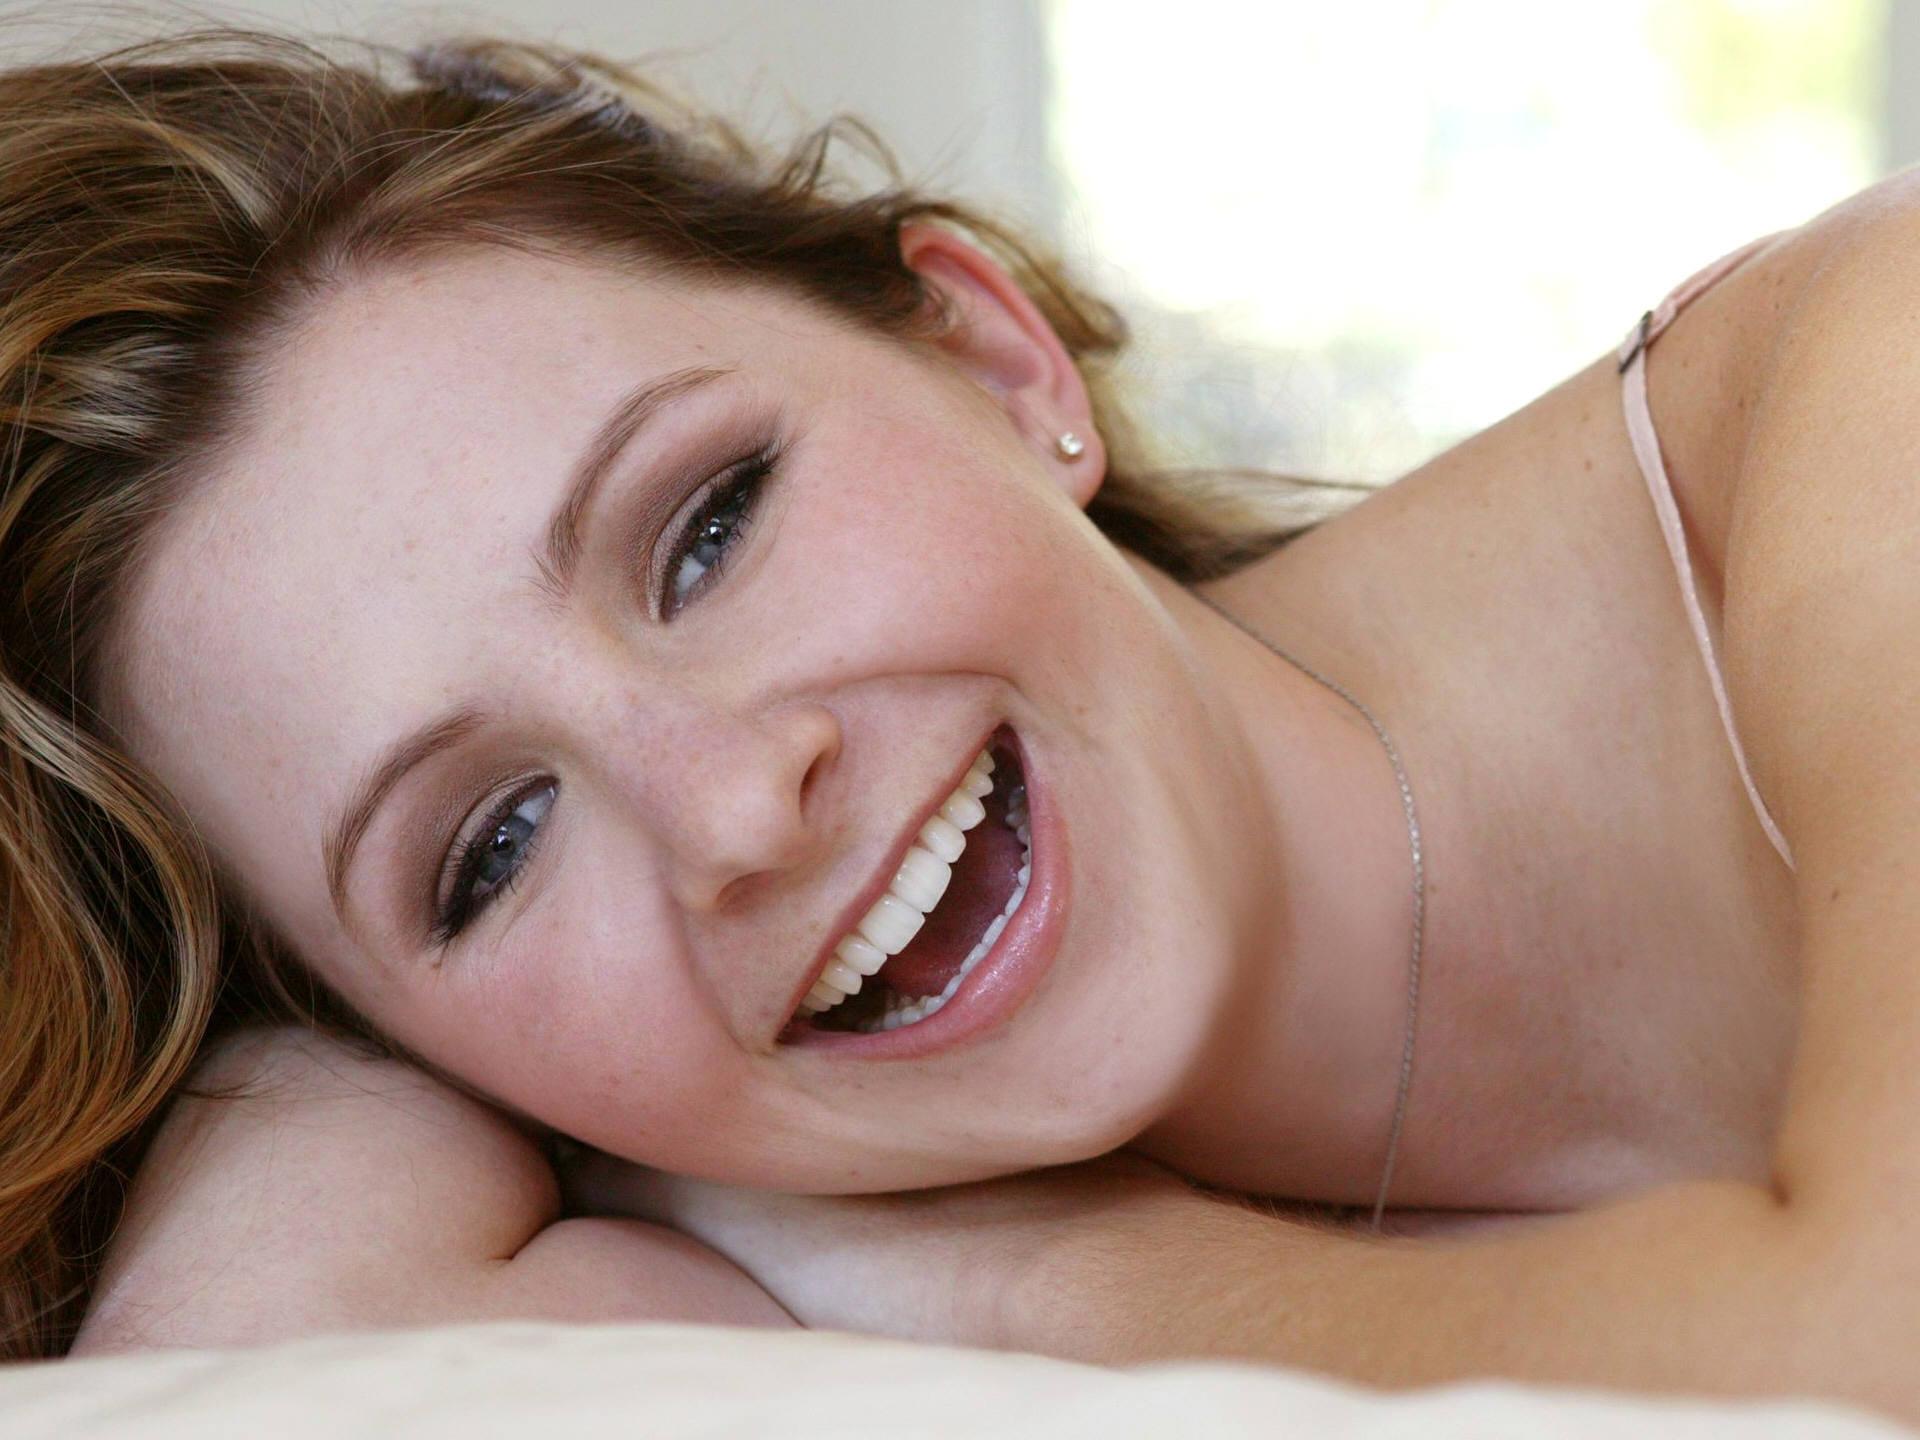 Chloe starr nude